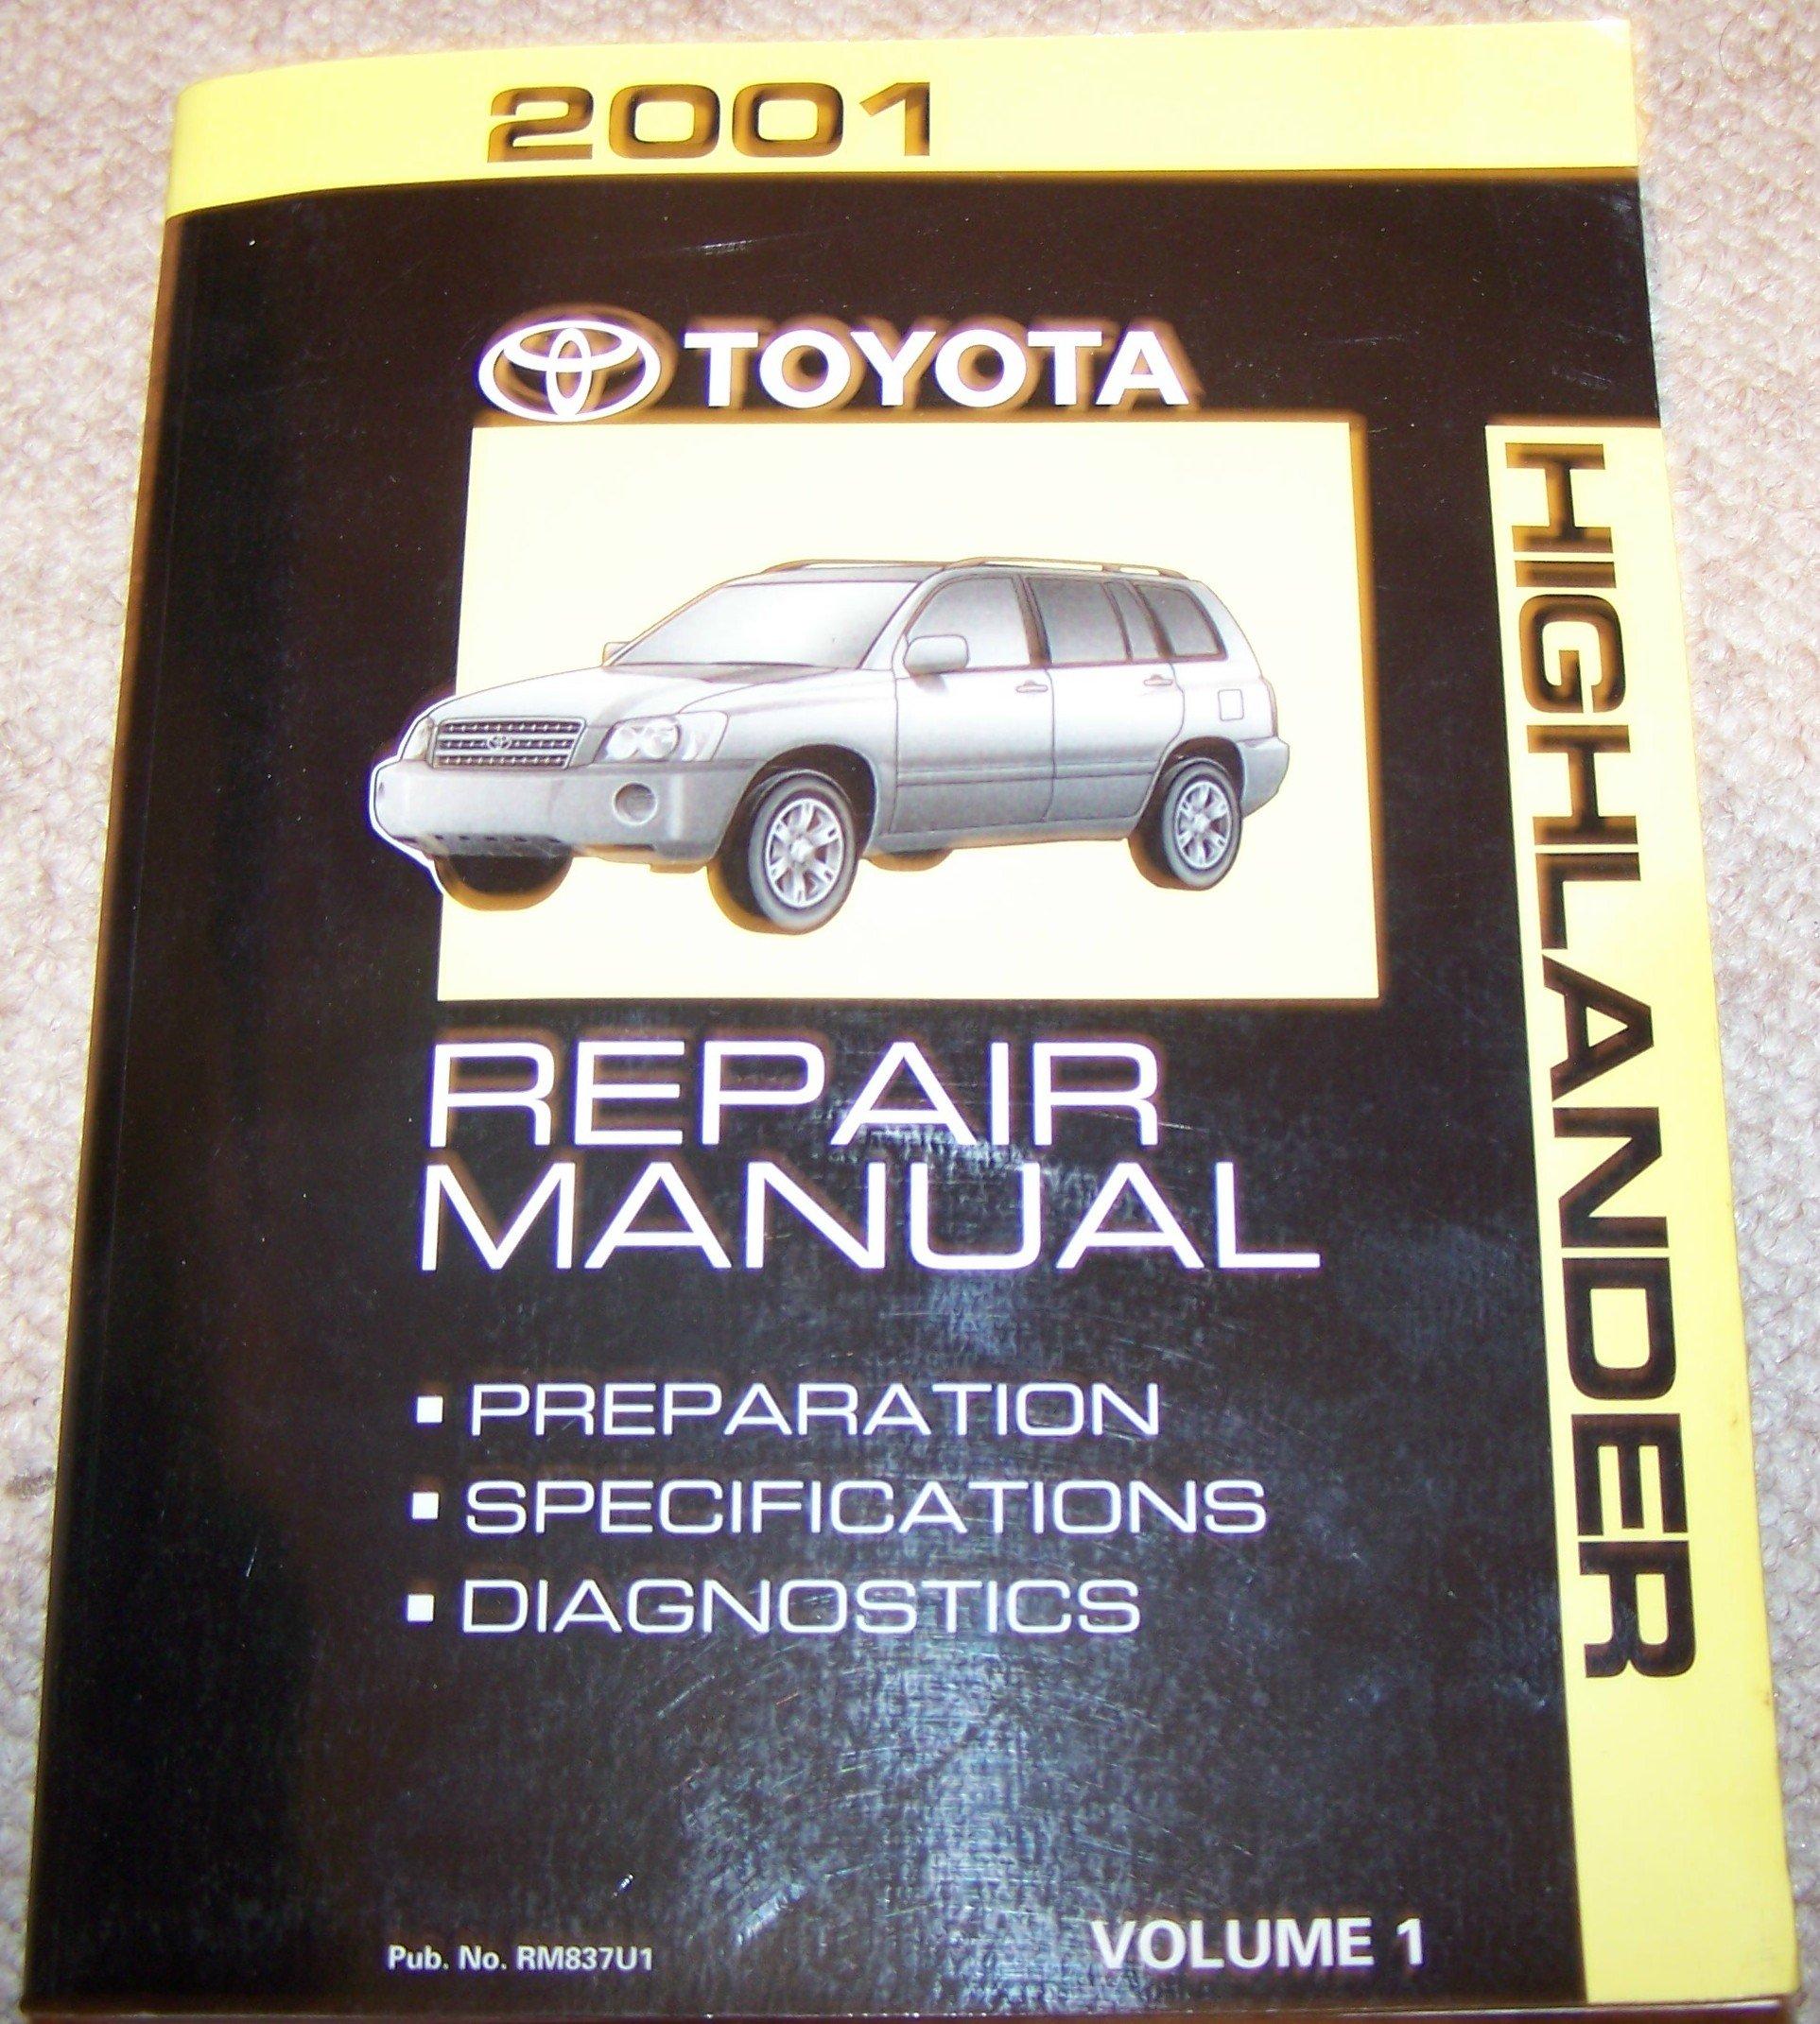 2001 Toyota Highlander Repair Manual: Toyota Motor Corp: Amazon.com: Books